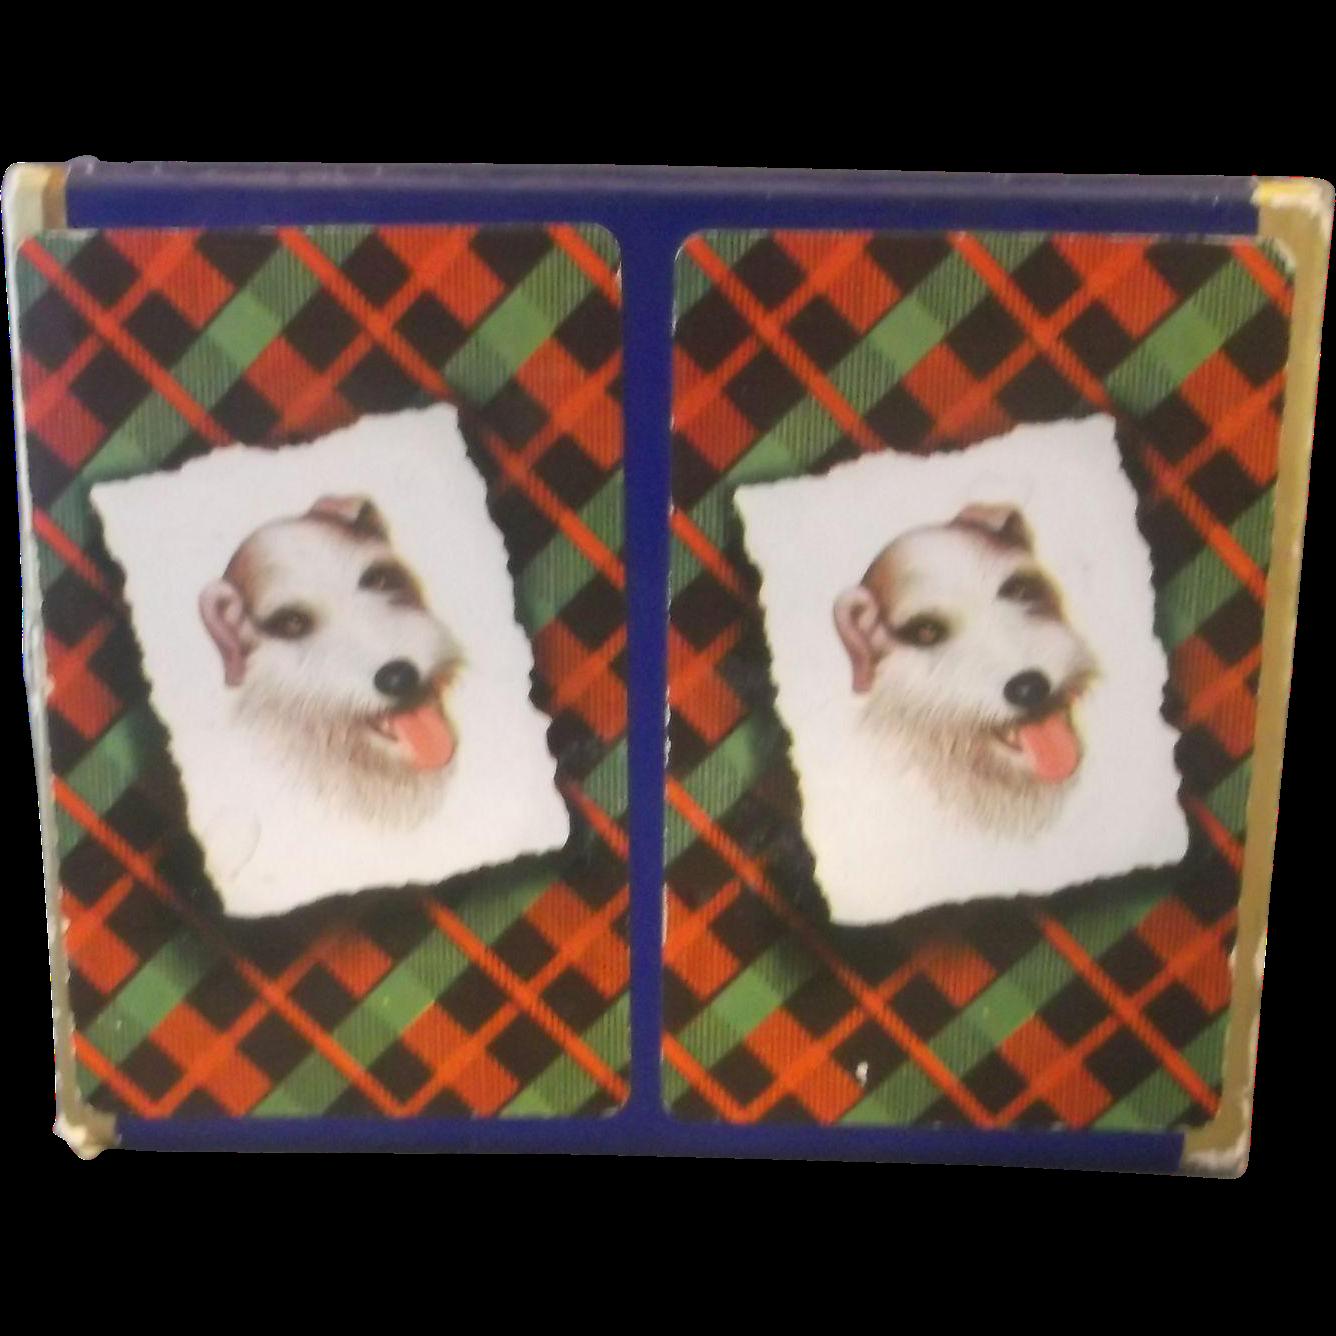 Fox Terrier Playing Cards Double Plastic Coated Deck in Box Deluxe St Regis Canasta Bridge